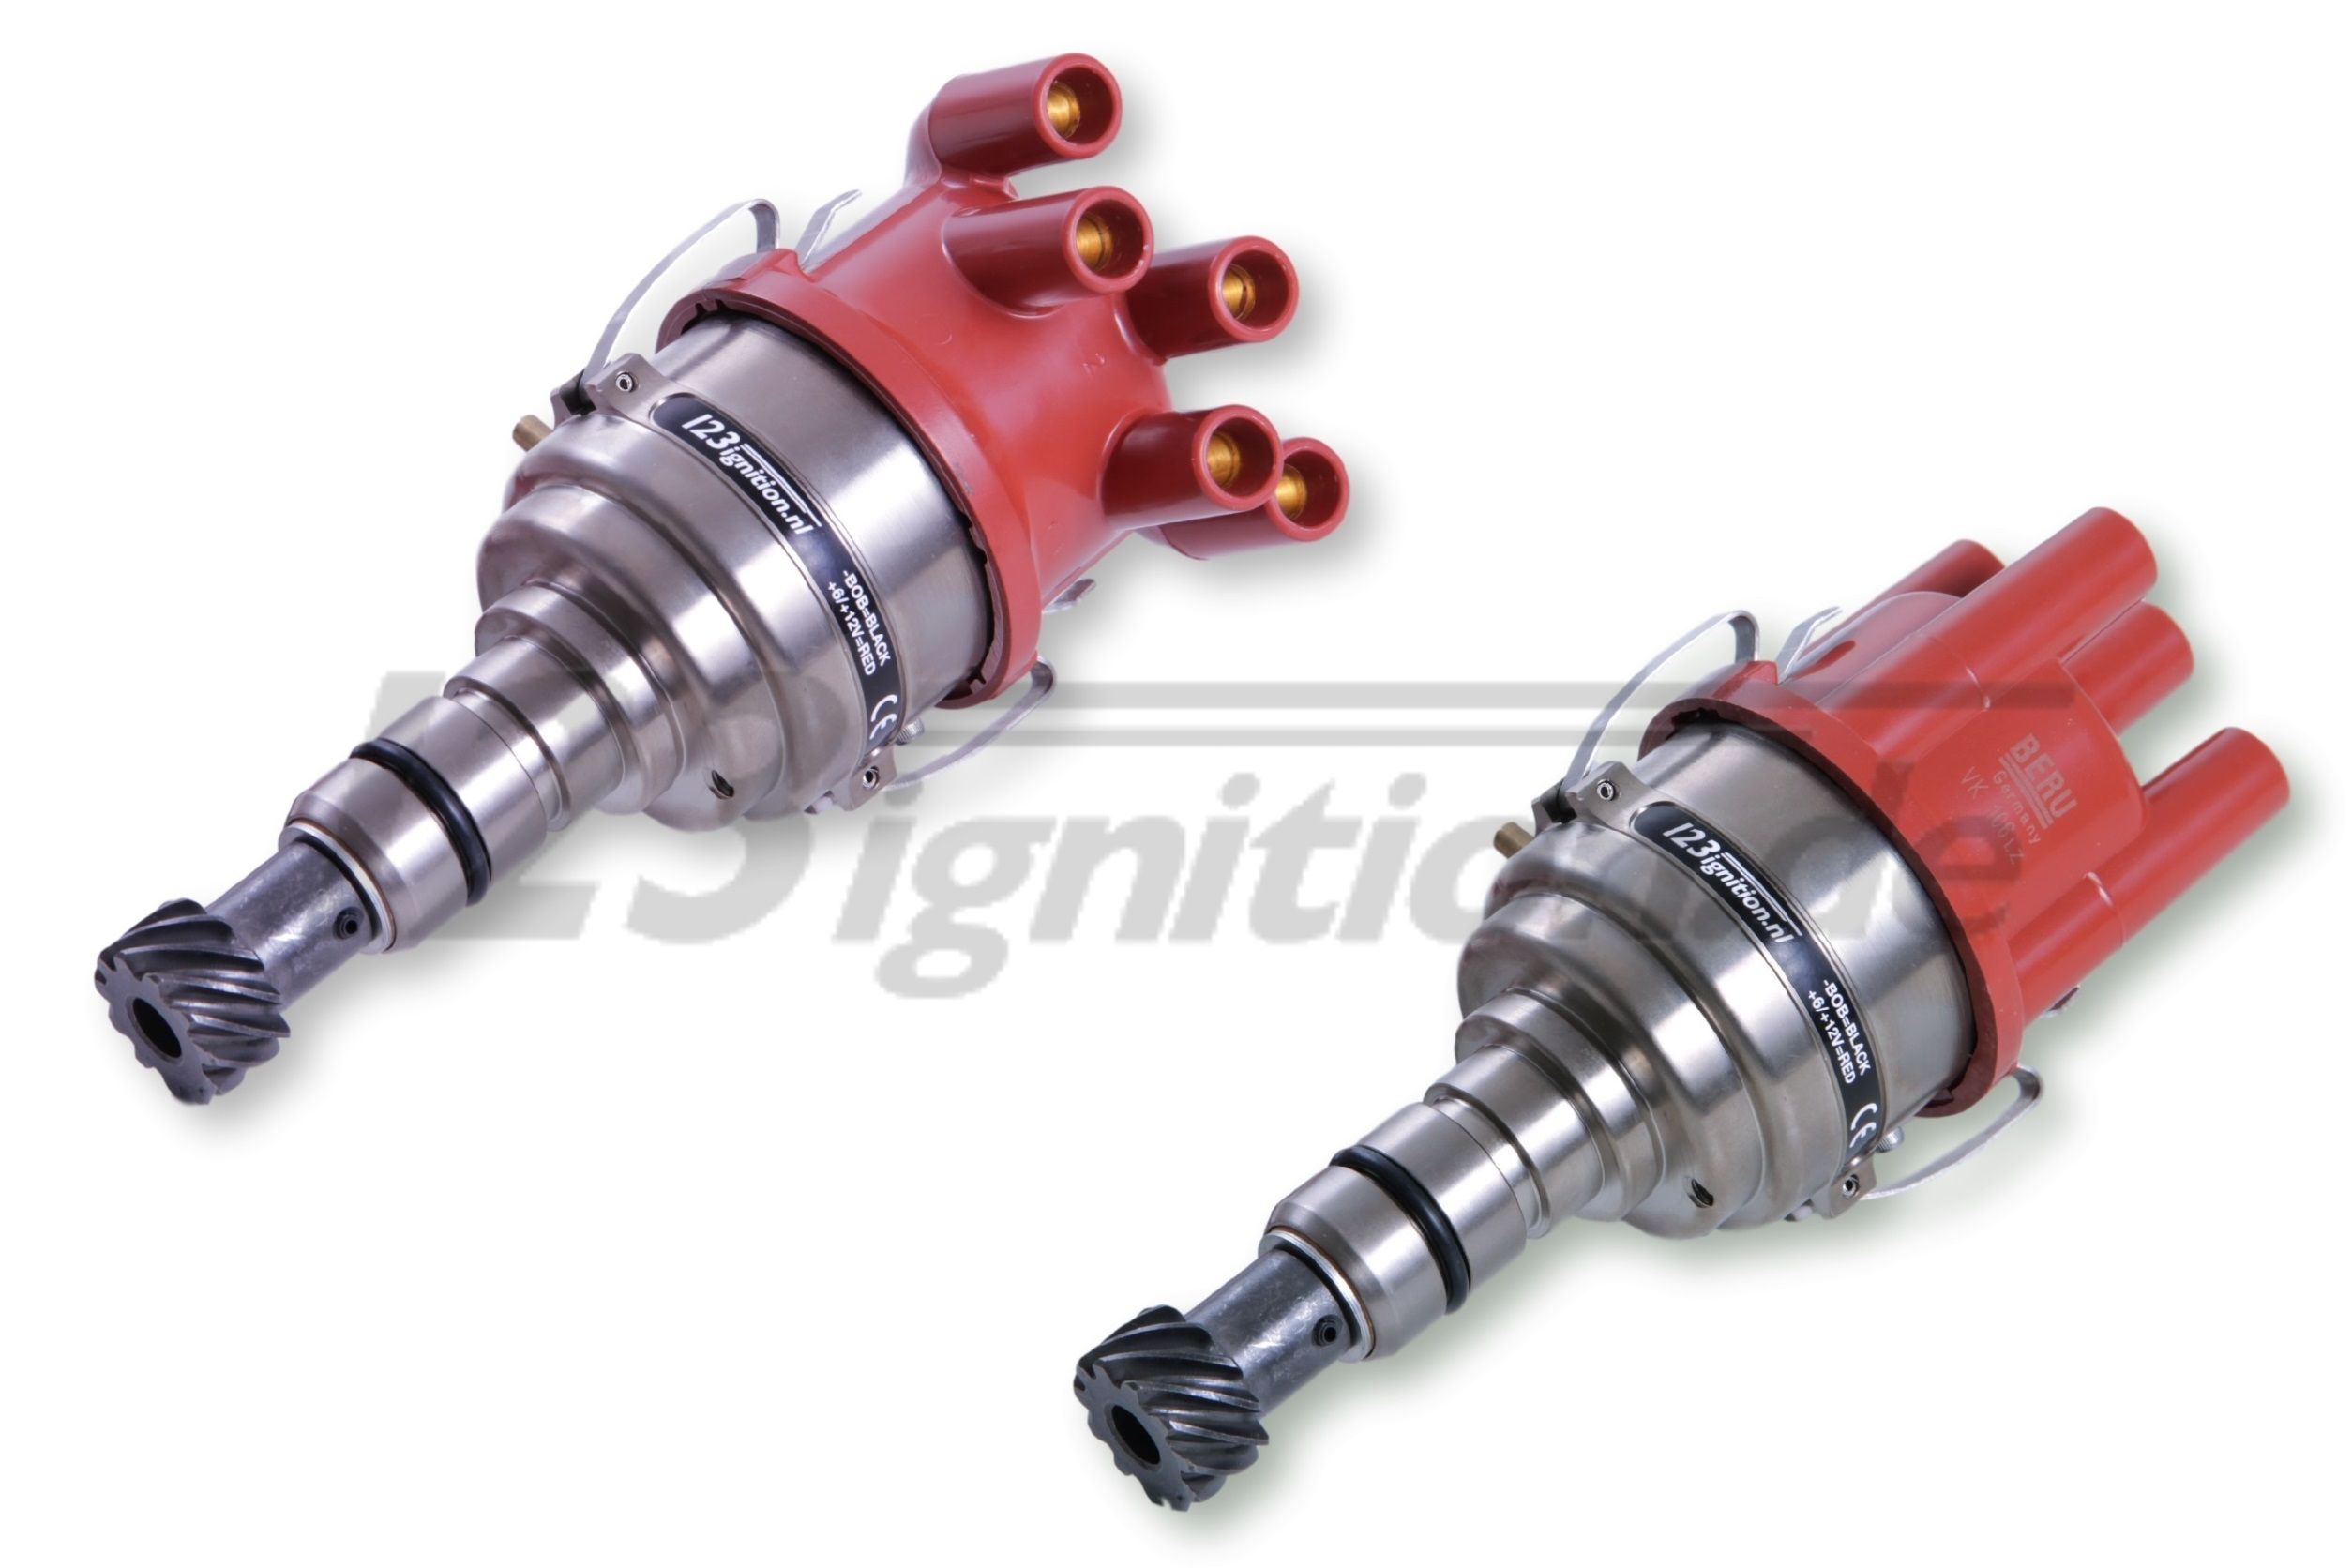 123 Ignition Bmw 02 1502 1602 1802 2002 Tii Turbo M10 Boutique En Ligne